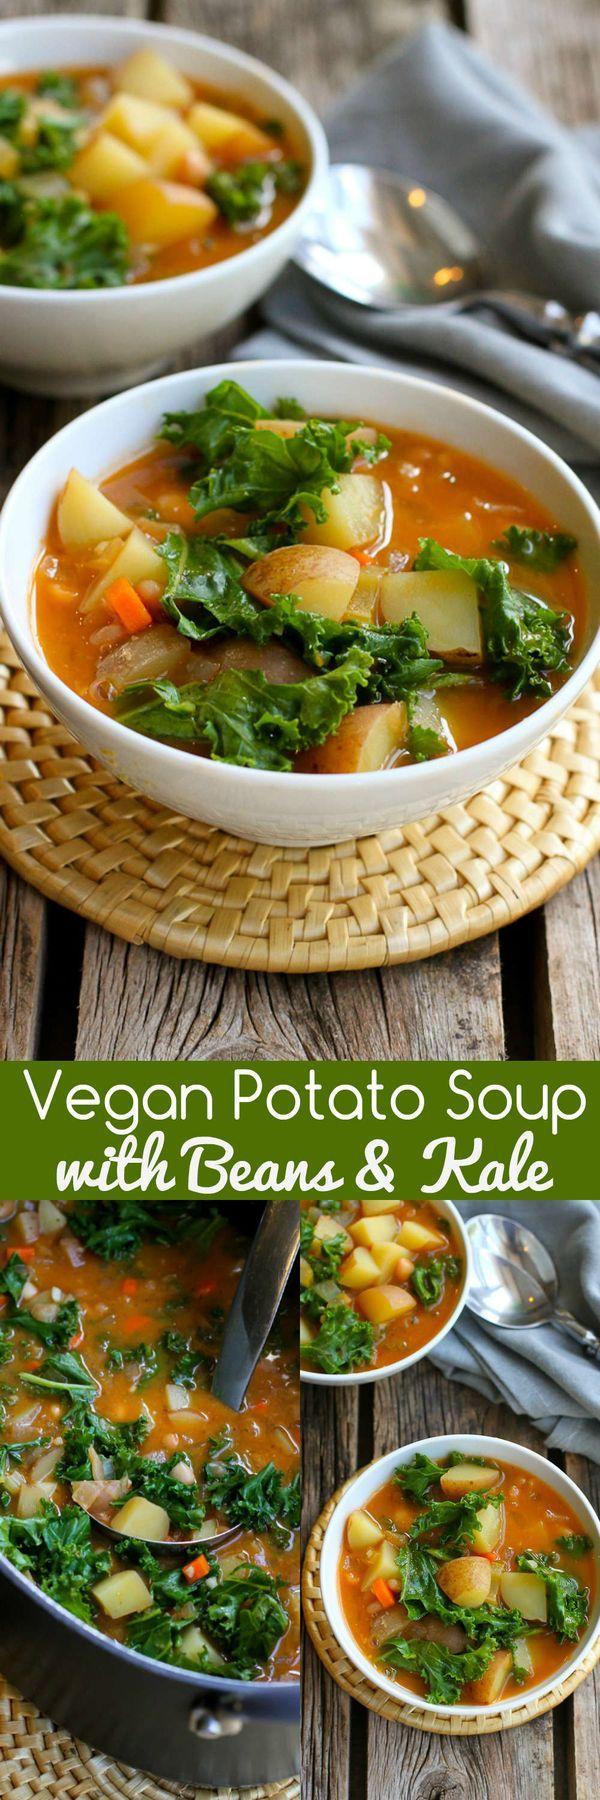 1 Carrot, medium. 1 large stalk Celery. 3 Garlic cloves. 1 (14 oz. can Great northern beans. 4 cups Kale. 1 1/2 lb Little potato company creamer potatoes. 1 Onion, medium. 3/4 tsp Rosemary, dried. 3 4 tsp tsp Thyme, dried. 2 tbsp Tomato paste. 7 cups Vegetable broth, low-sodium. 1/4 tsp Pepper, ground. 1/2 tsp Red pepper. 1/2 tsp Salt. 2 tsp Olive oil.